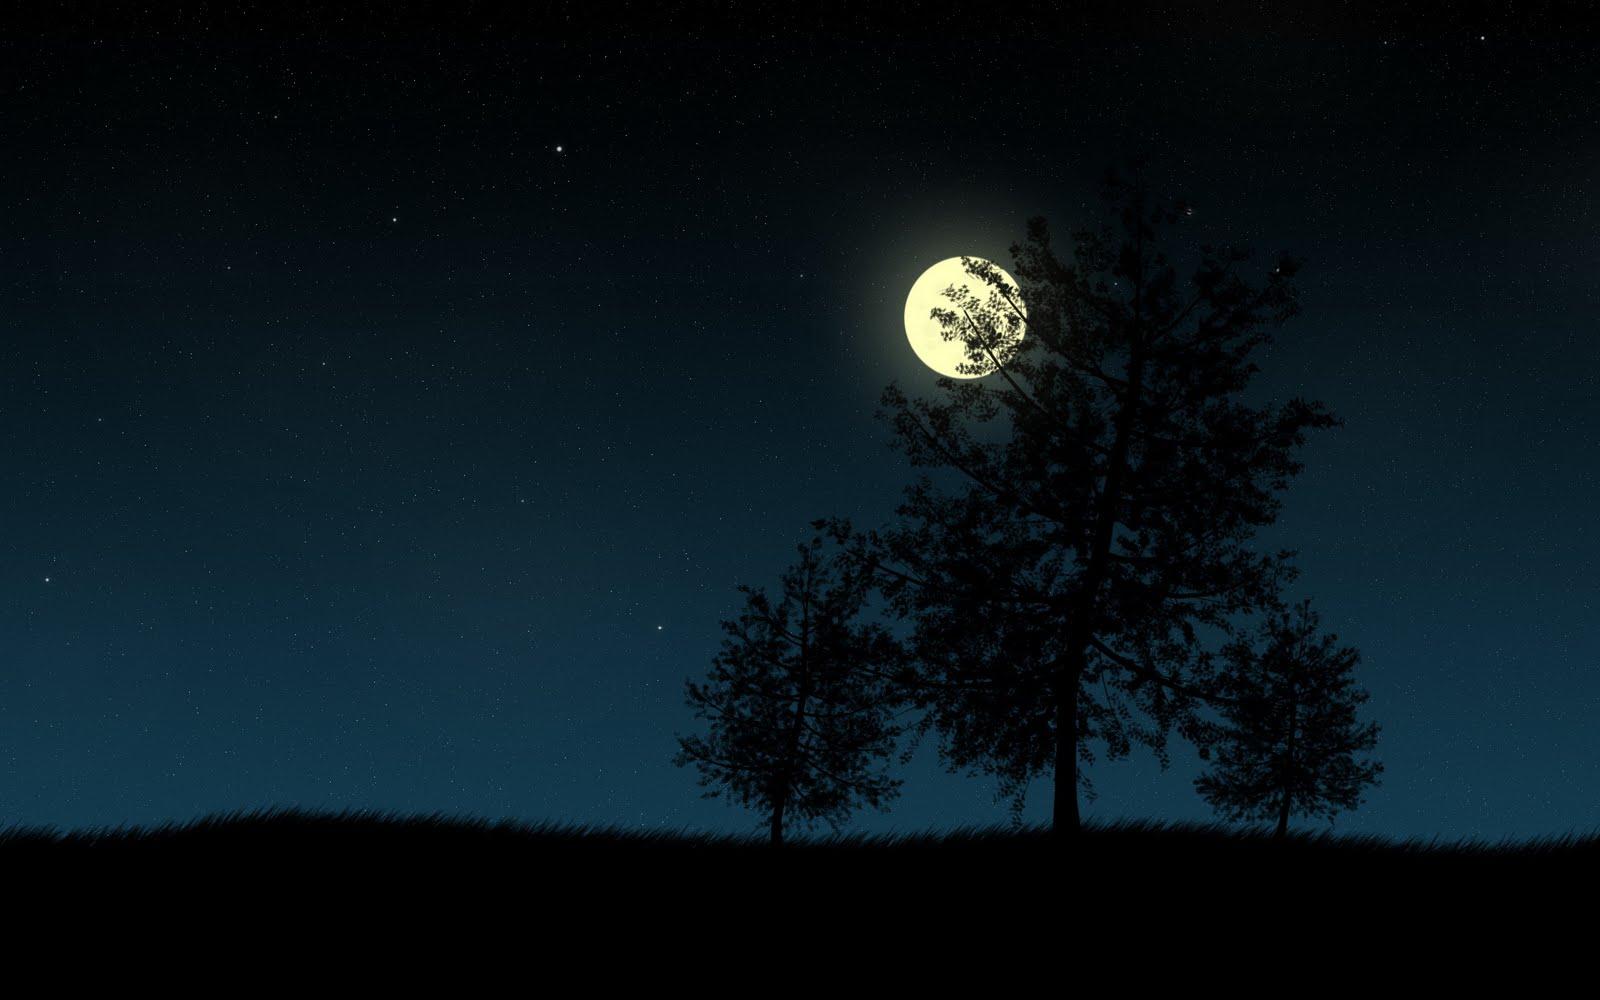 wallpapers full moon night - photo #31